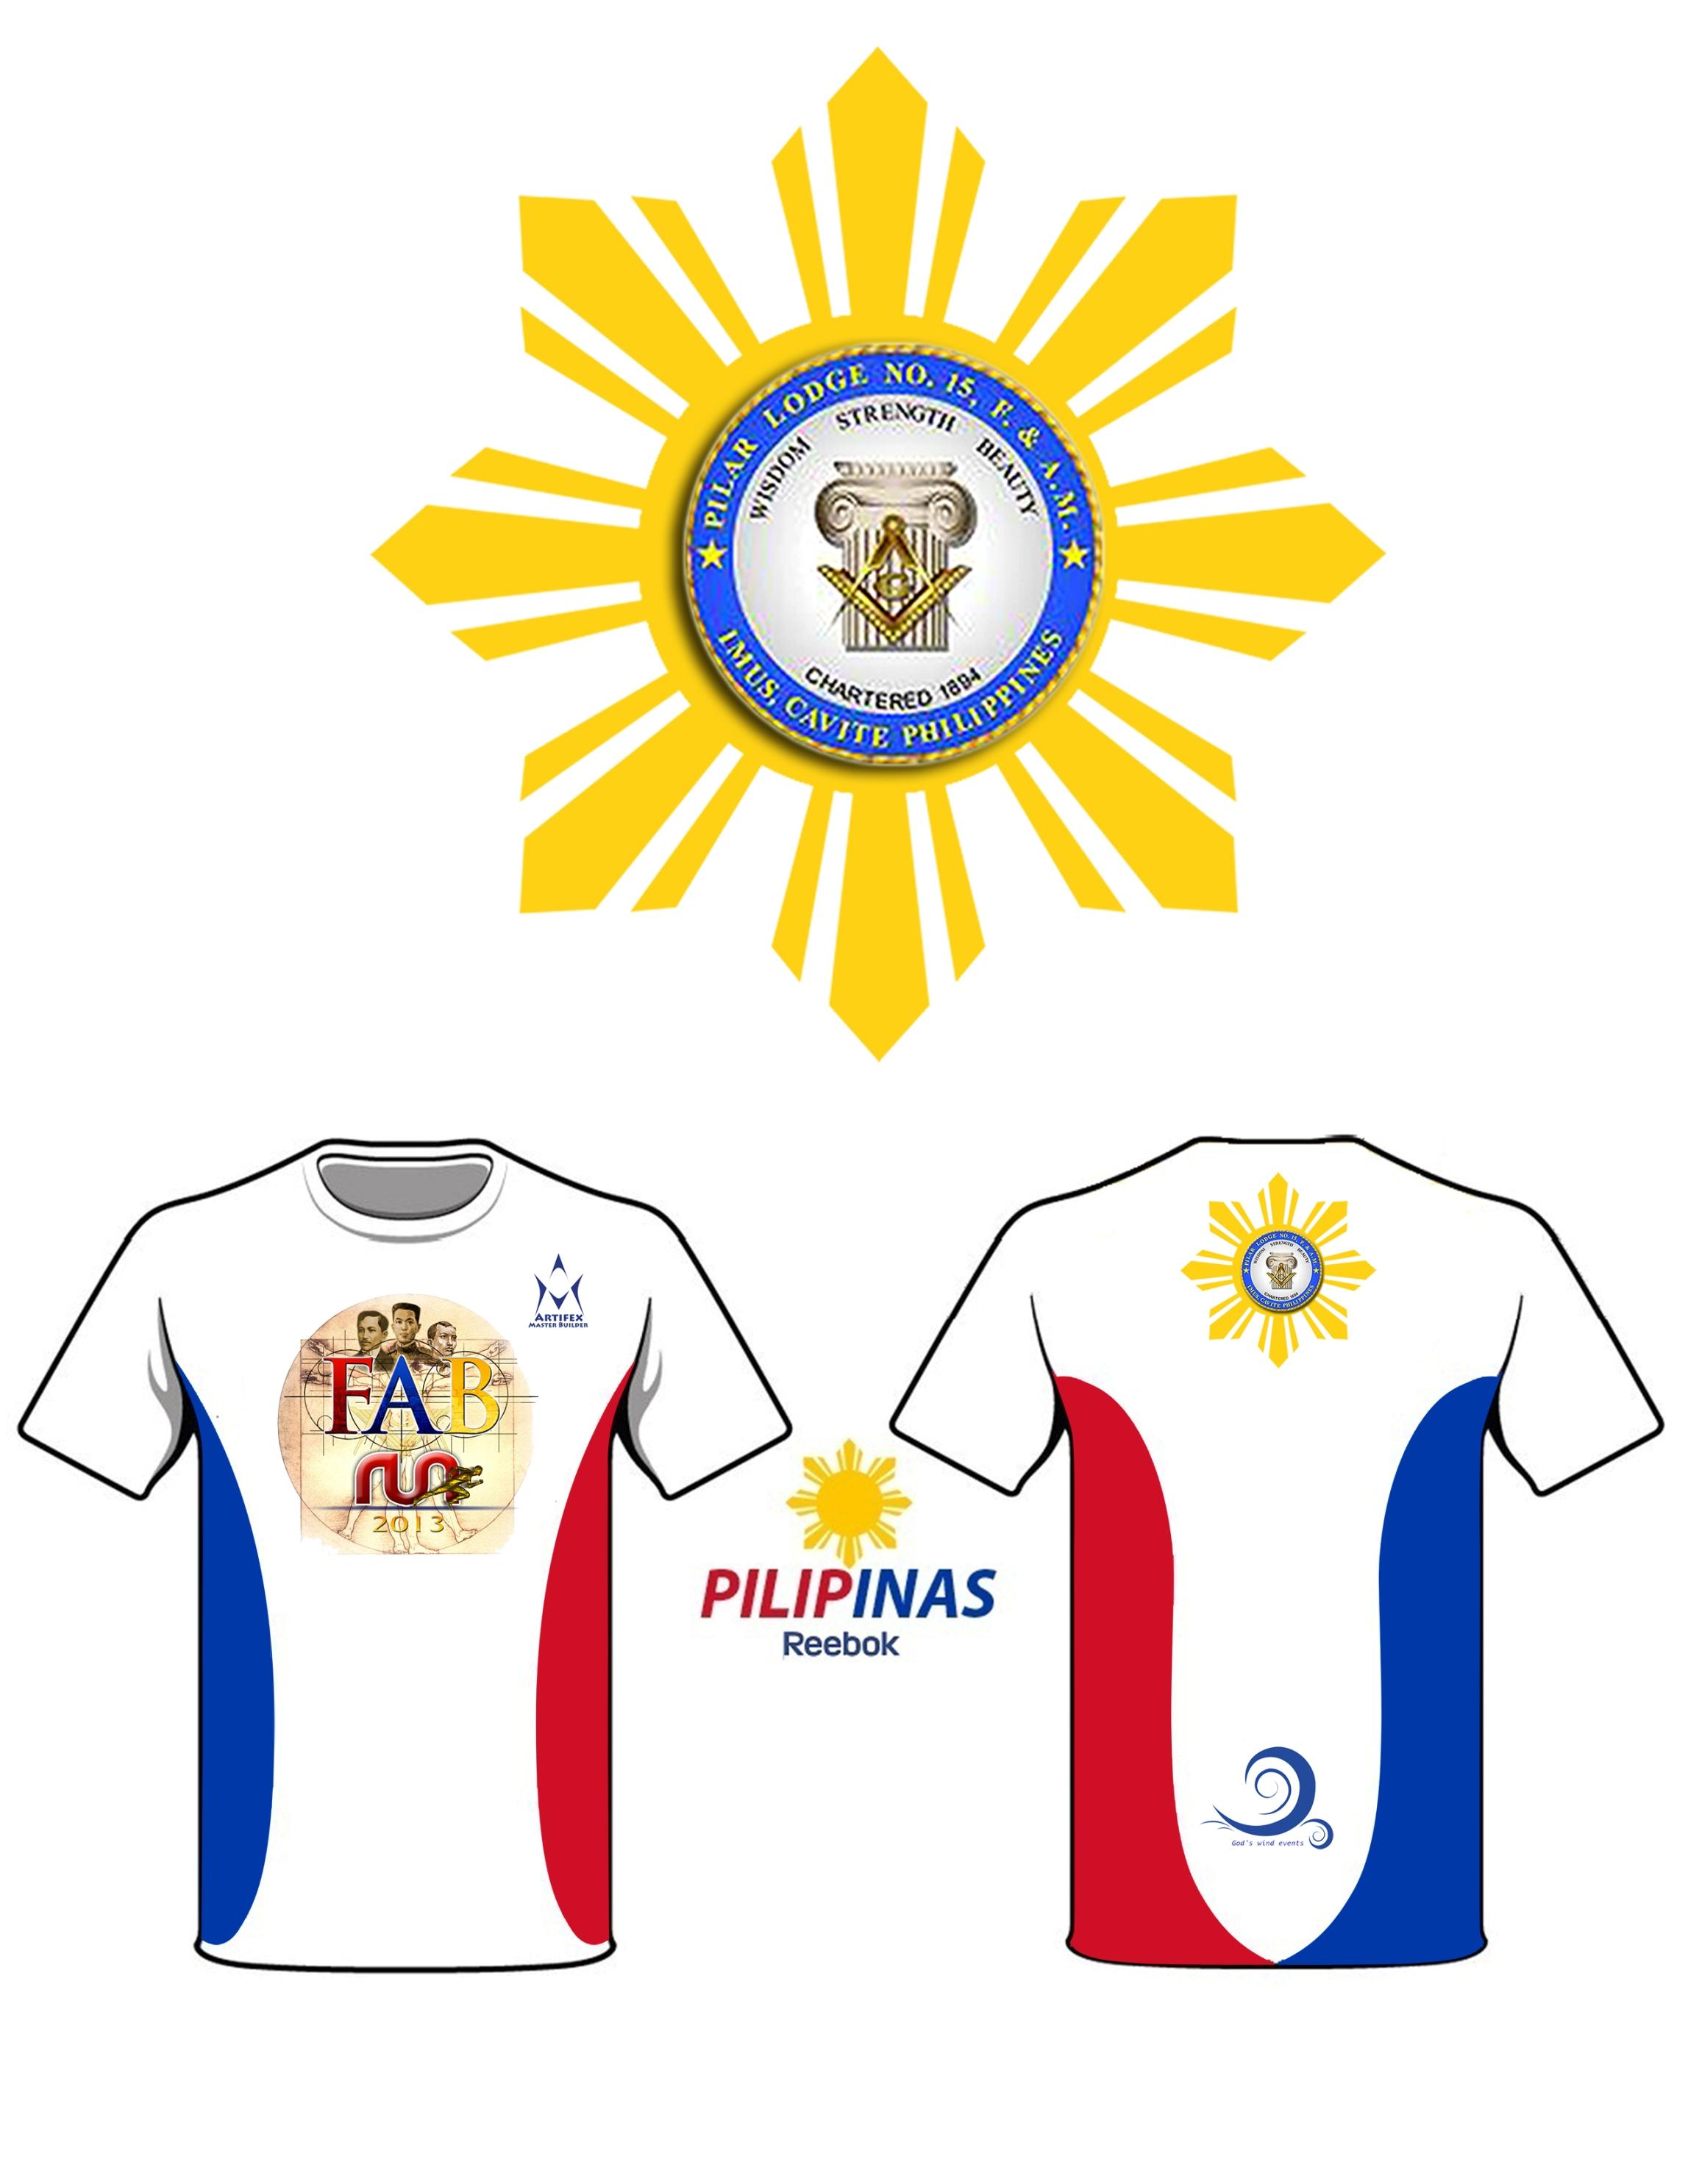 Fab run 2013 daang reyna las pinas pinoy fitness for Tech shirts running wholesale